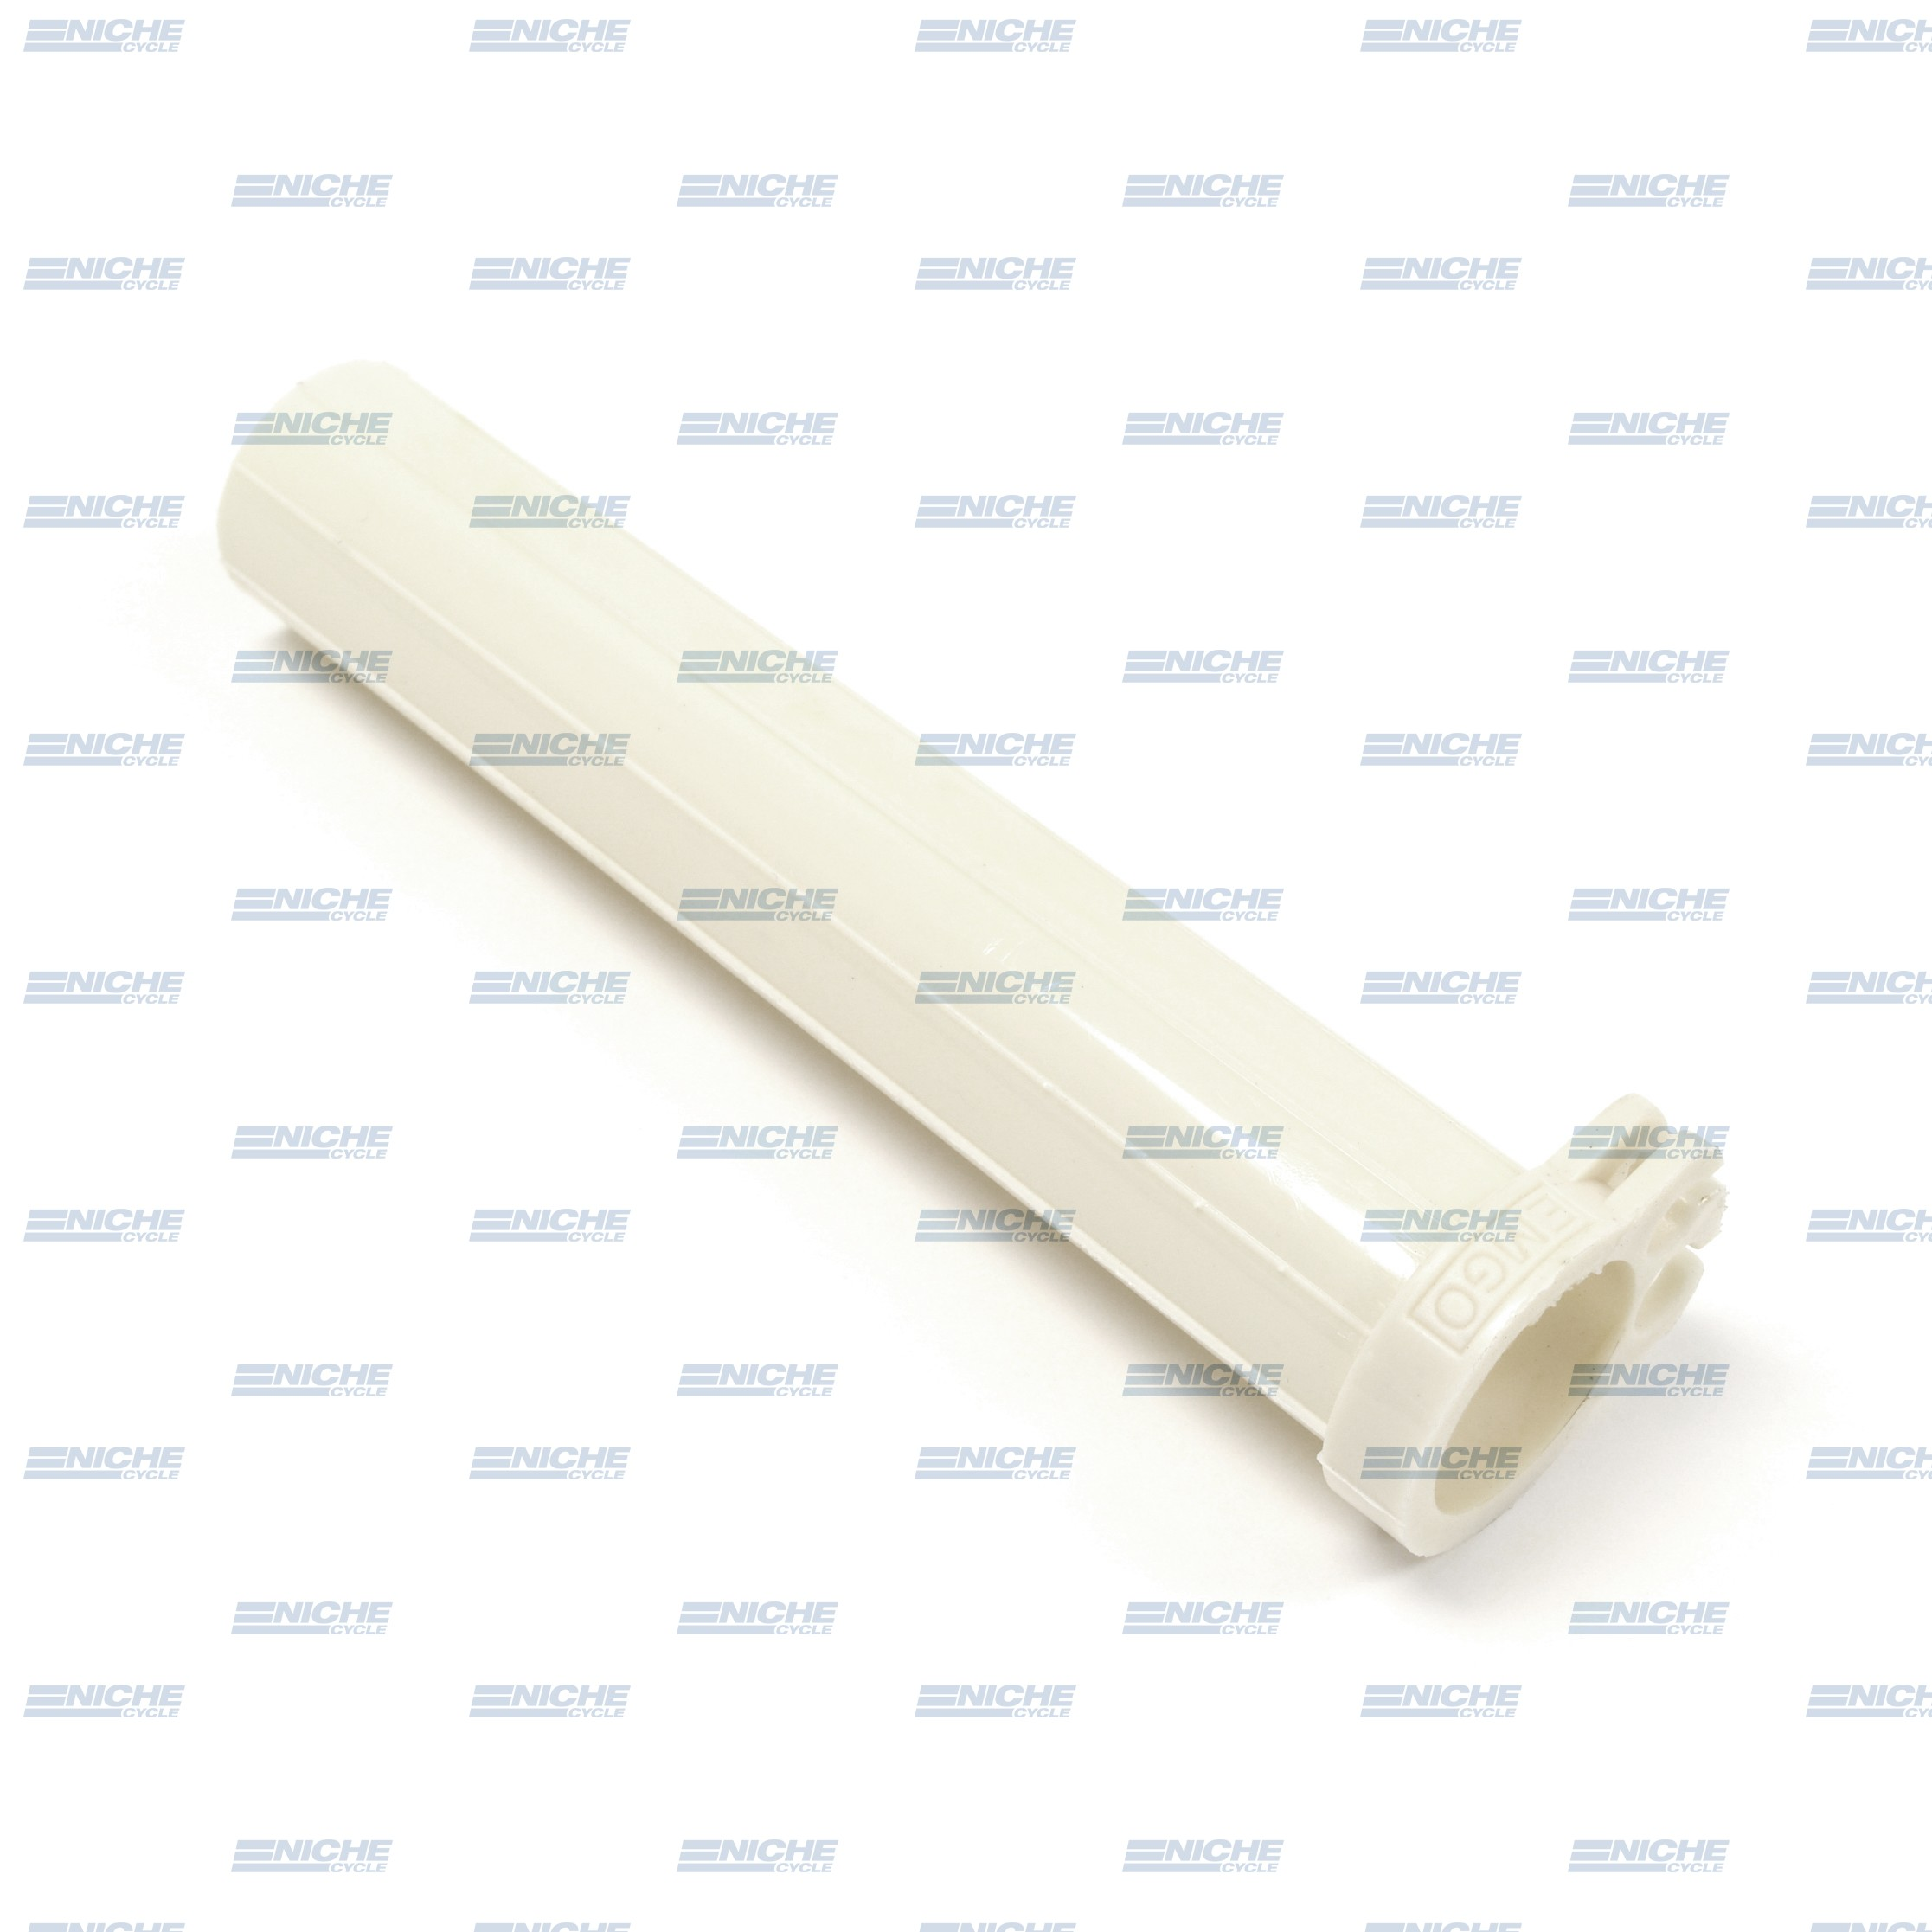 Honda Push/Pull Throttle Sleeve Tube 53141-300-010 44-97773